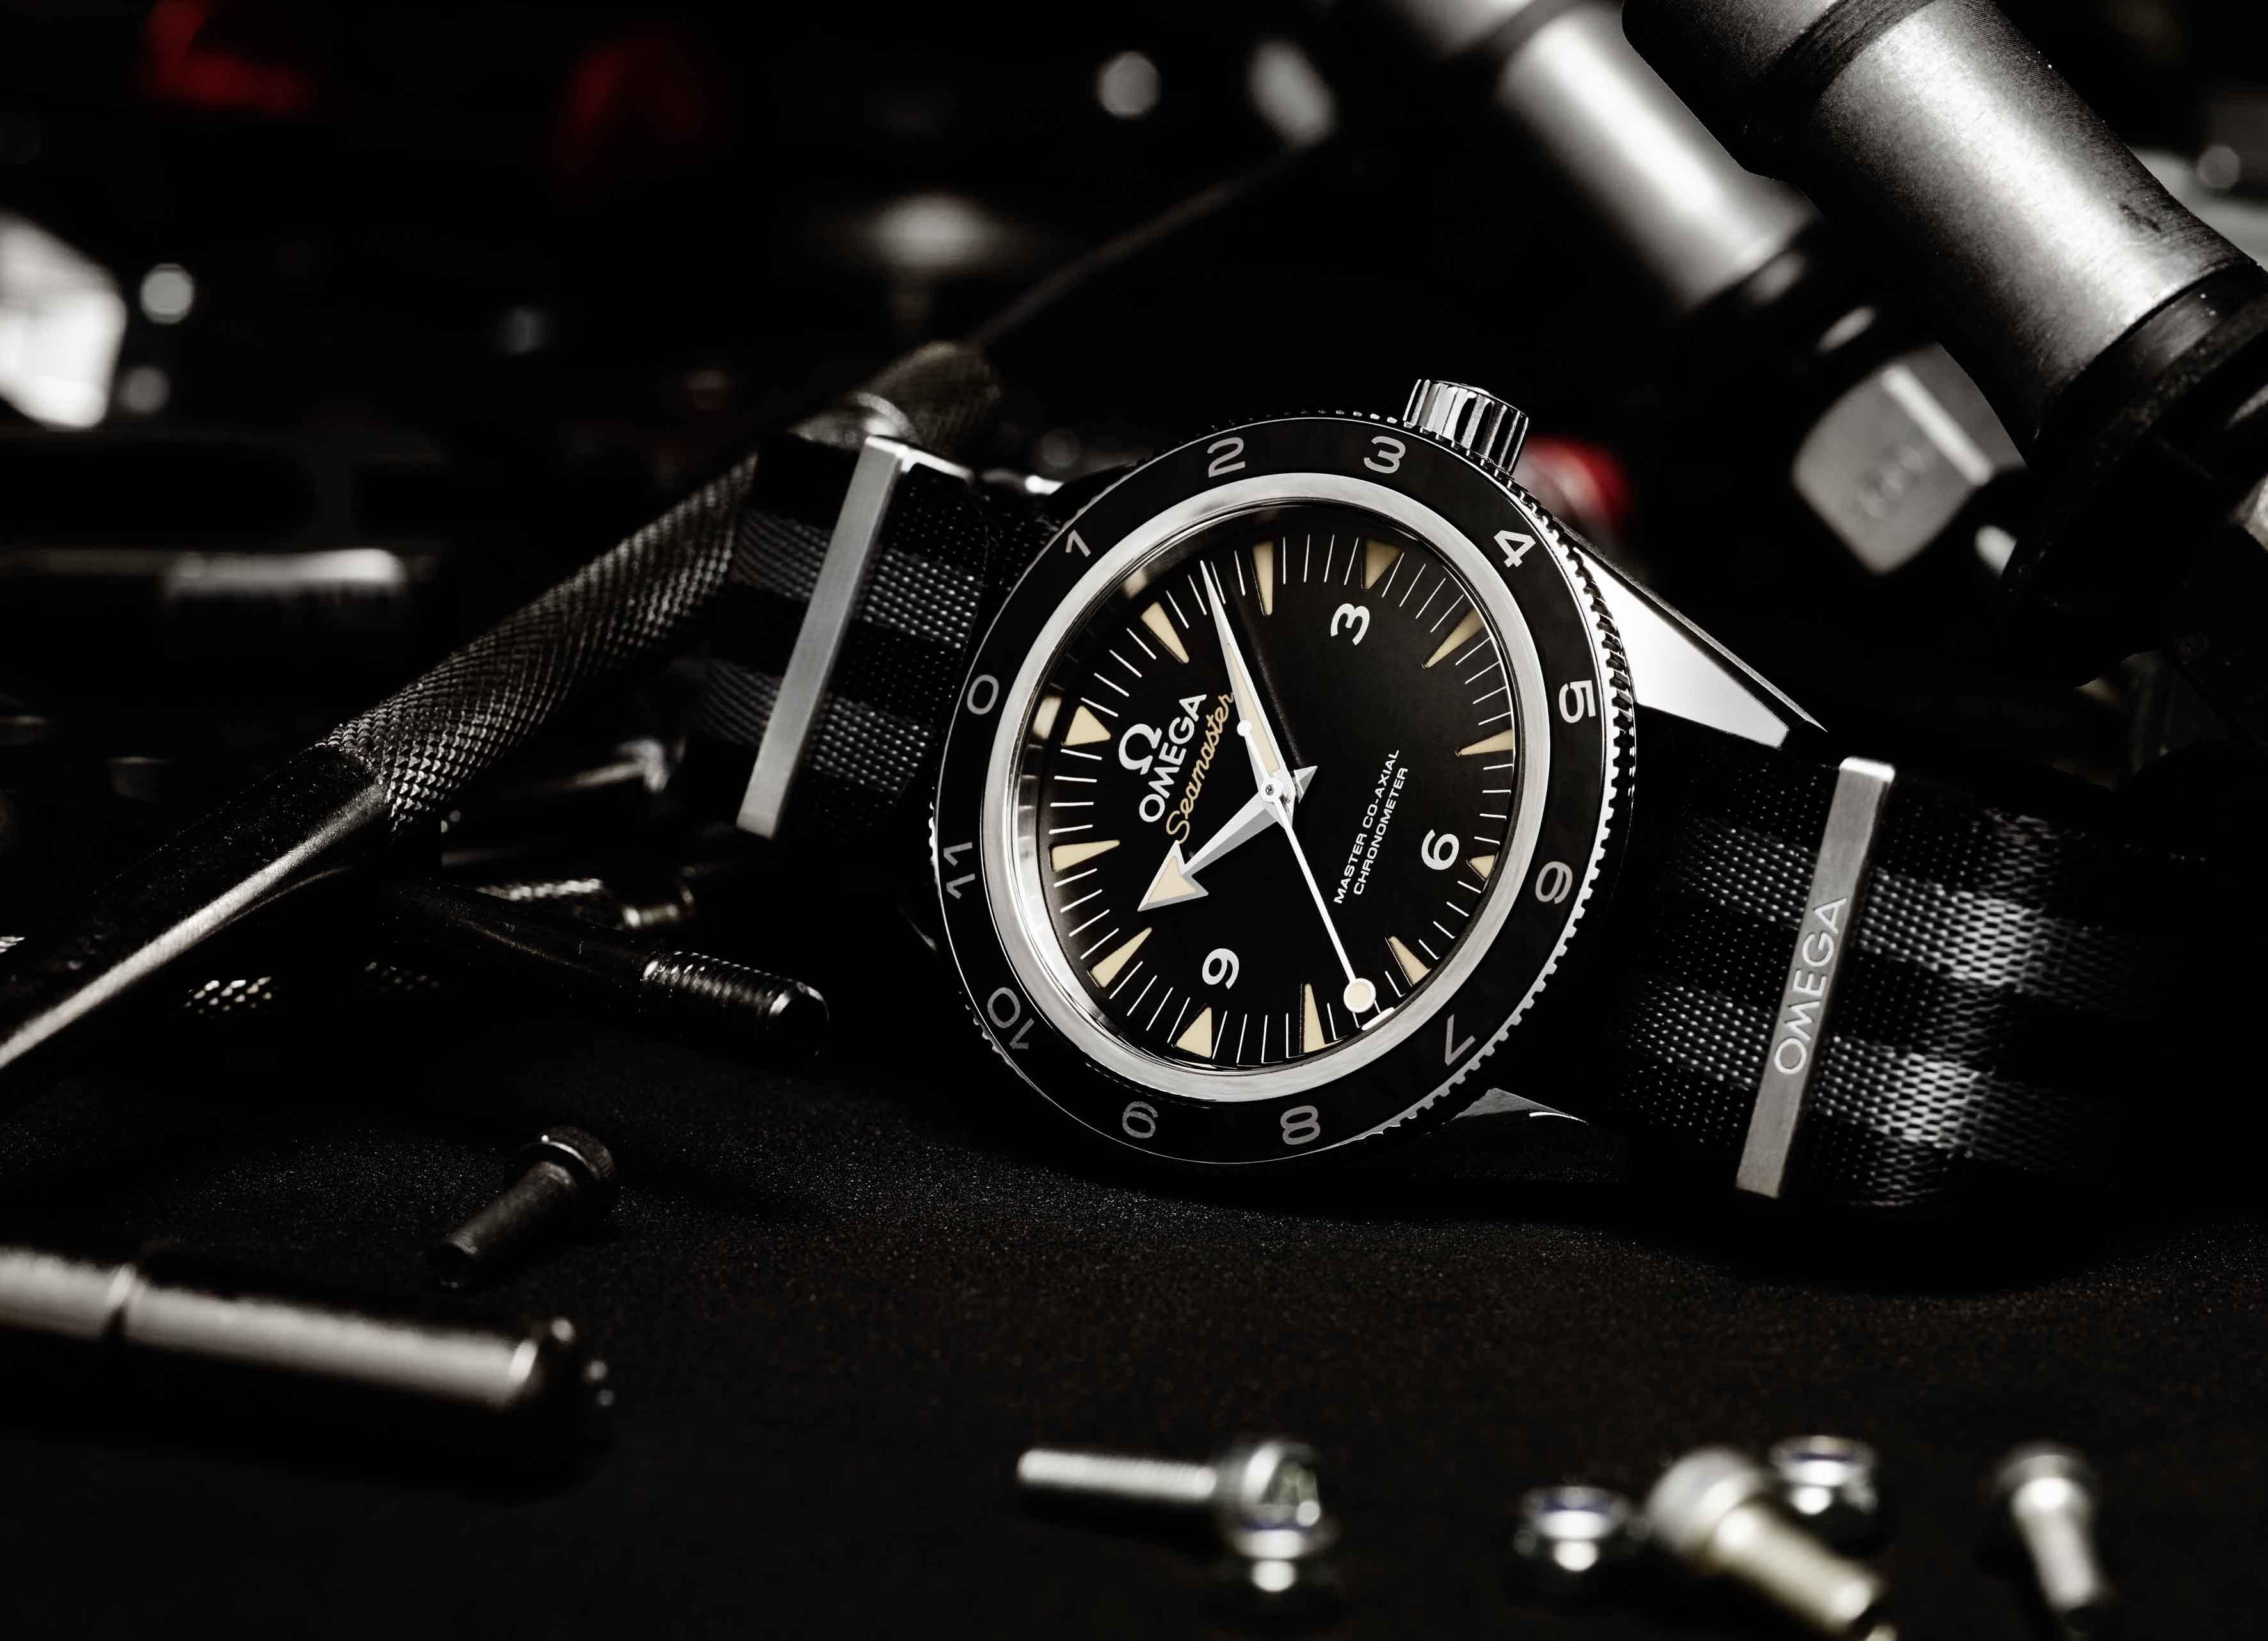 James Bond Omega Seamaster 300 Spectre Film